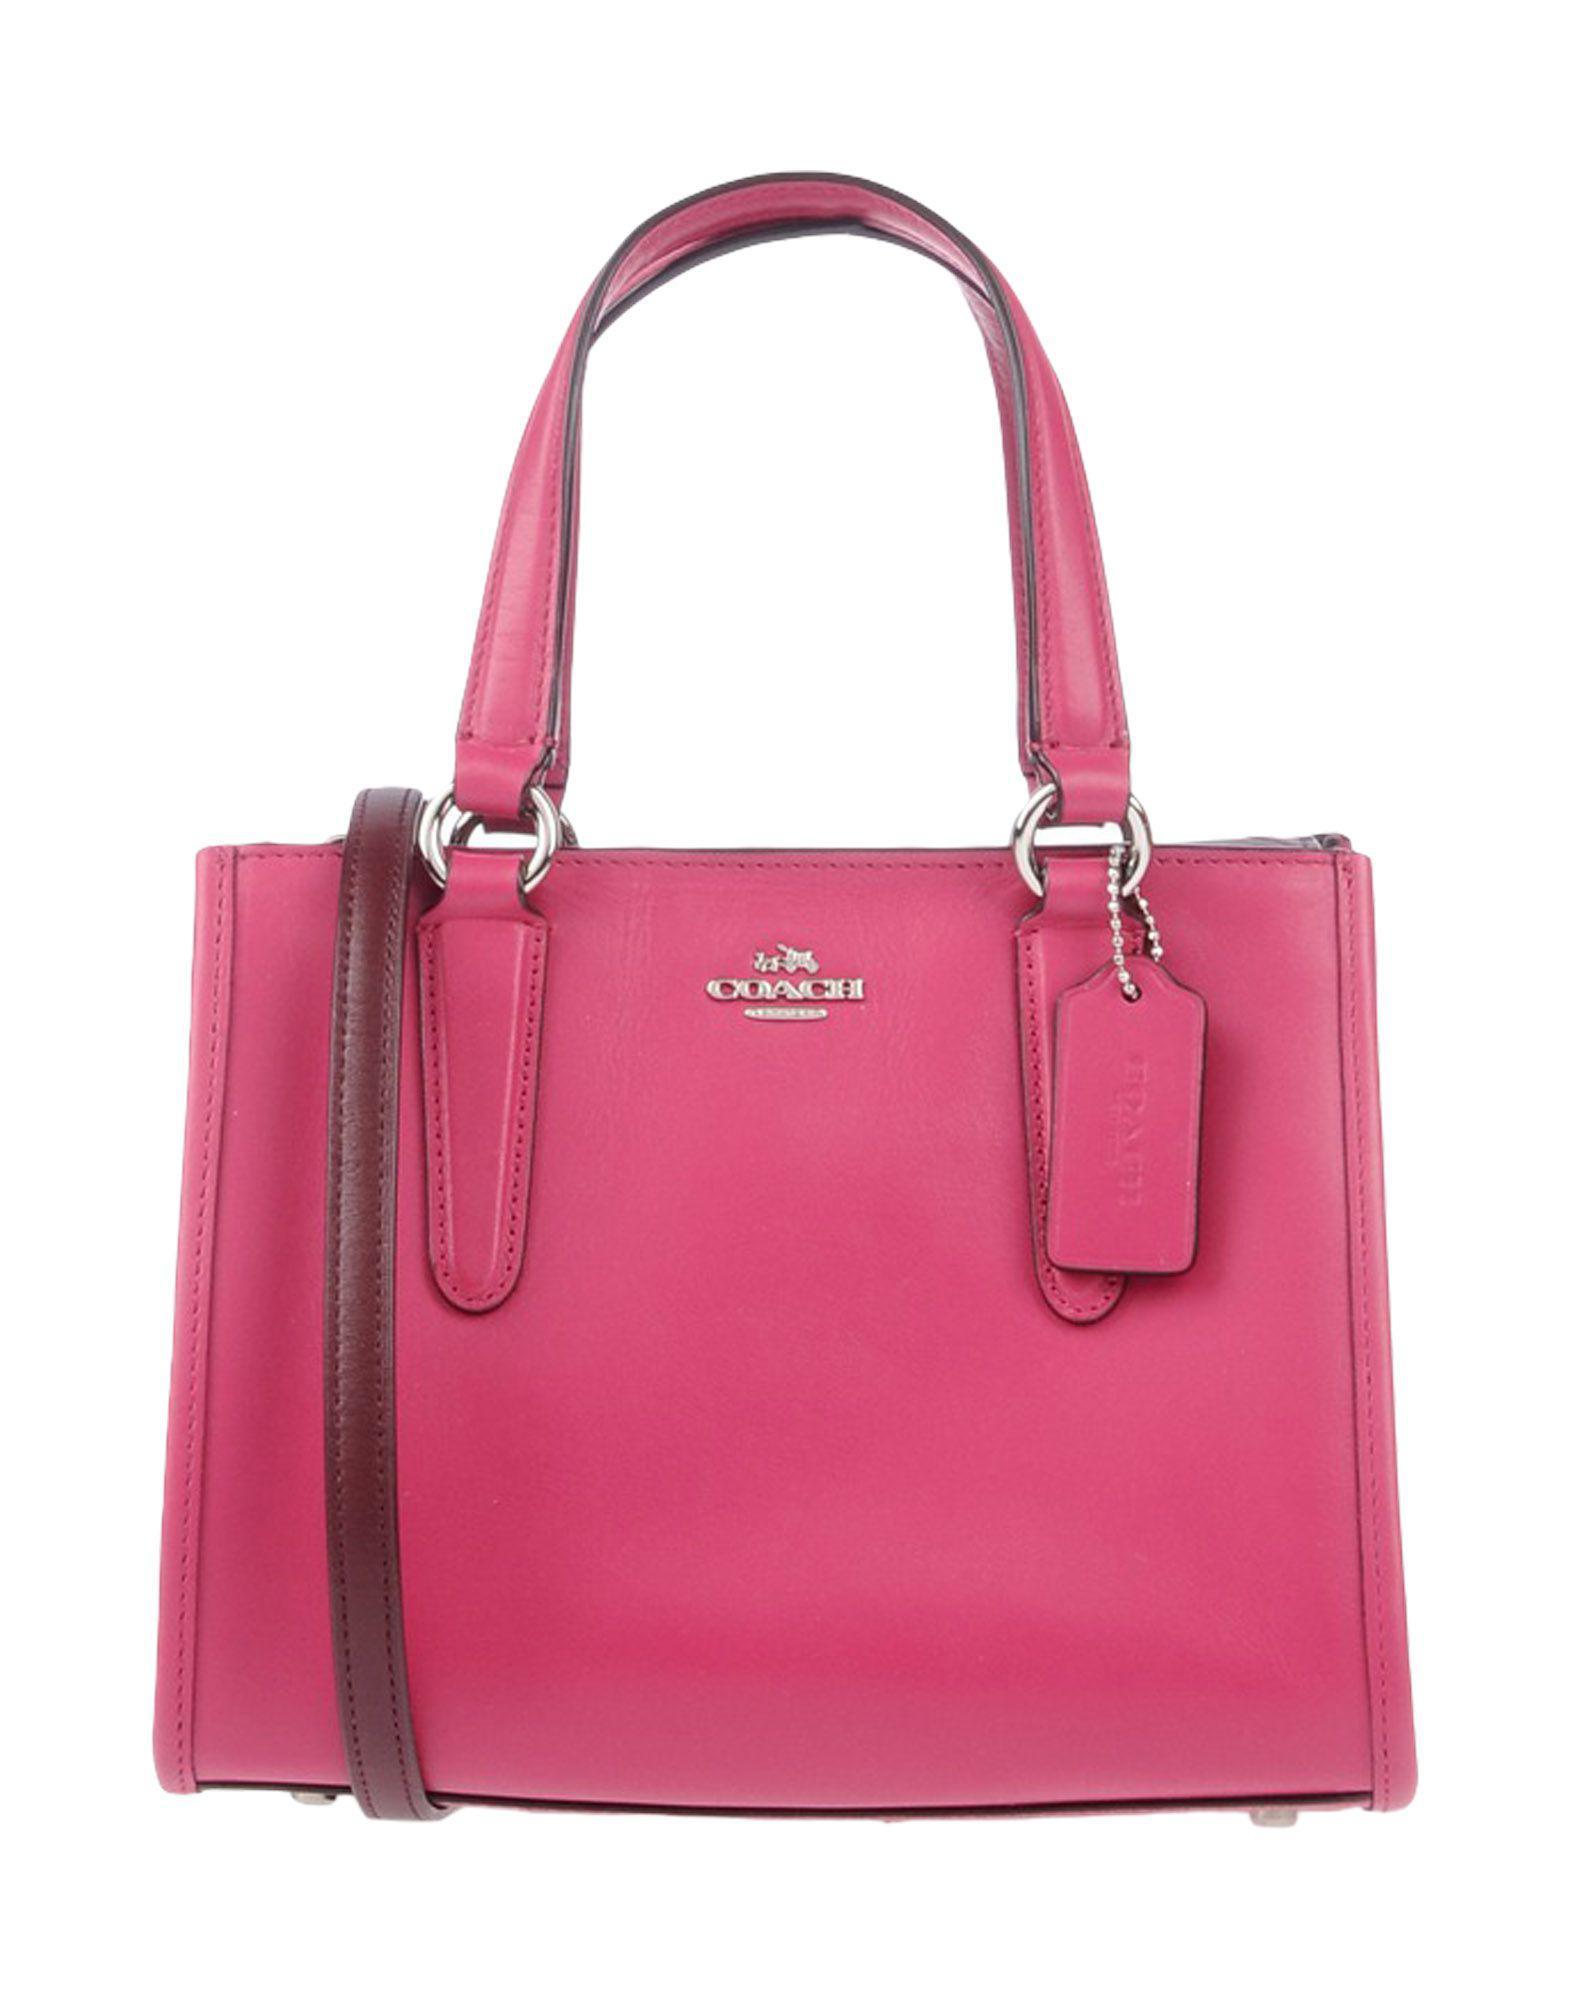 55a56dea4687 Coach Handbag - Lyst